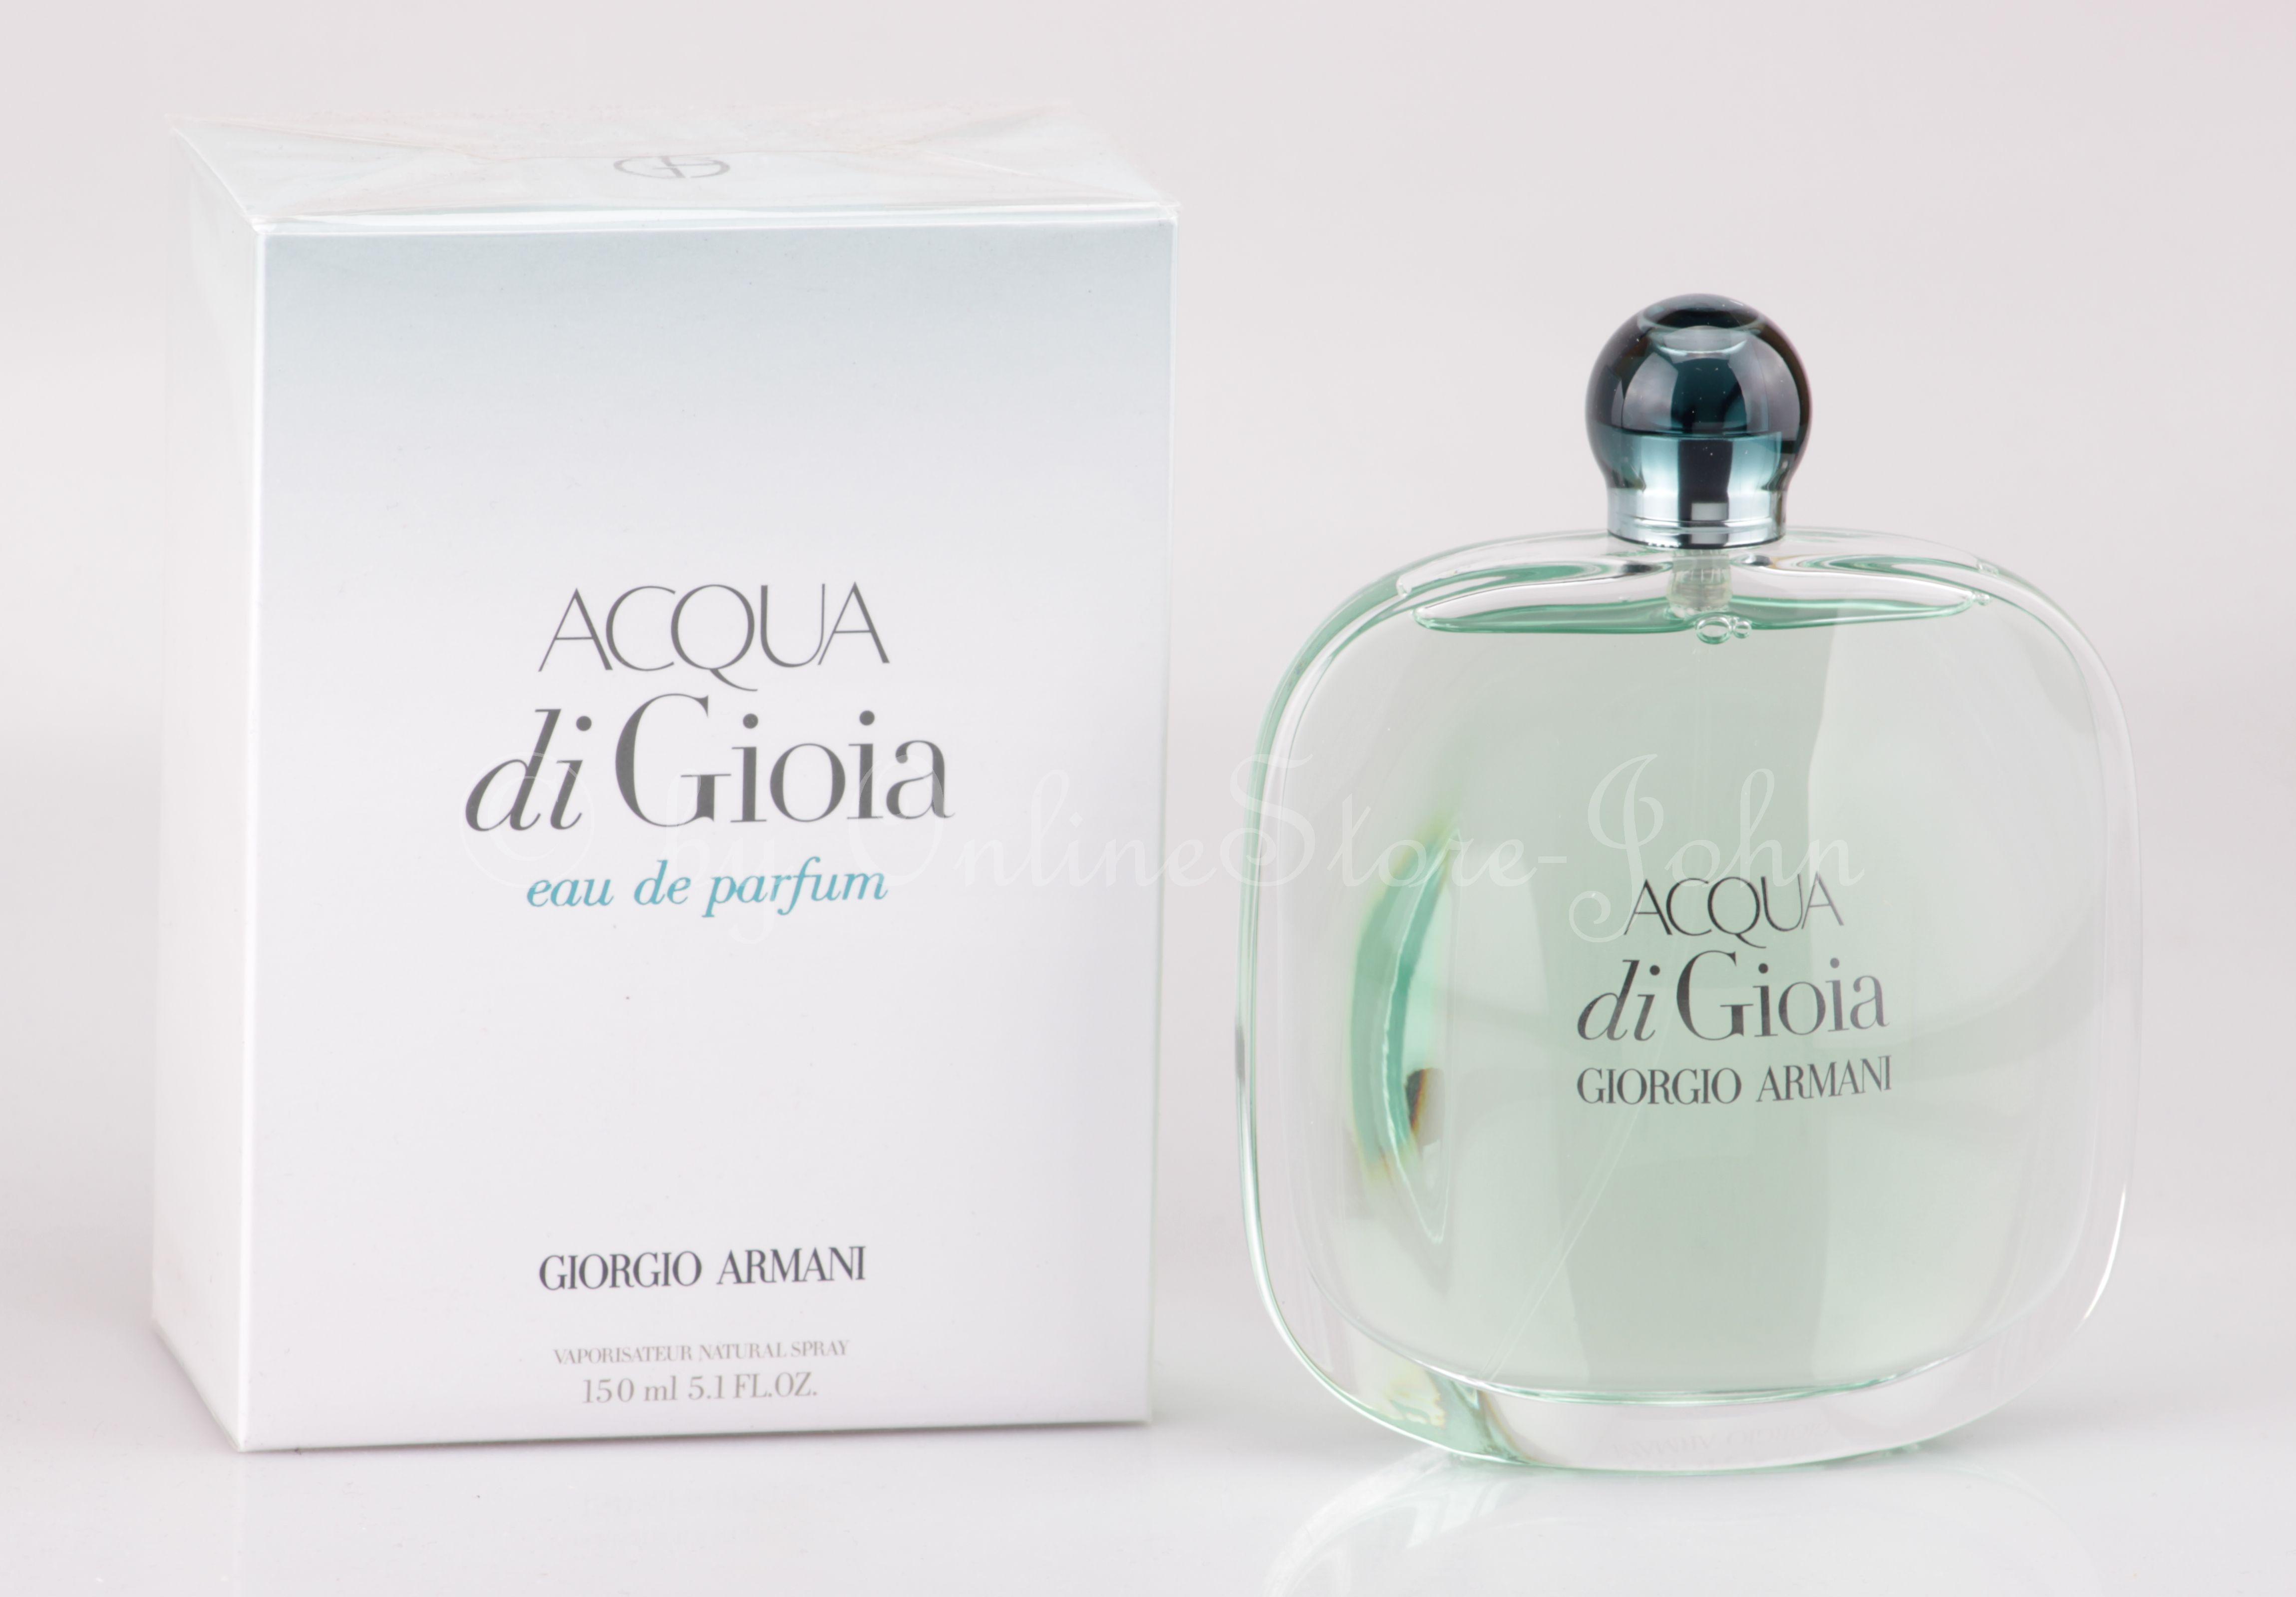 Giorgio Armani Acqua Di Gioia 150ml Edp Eau De Parfum